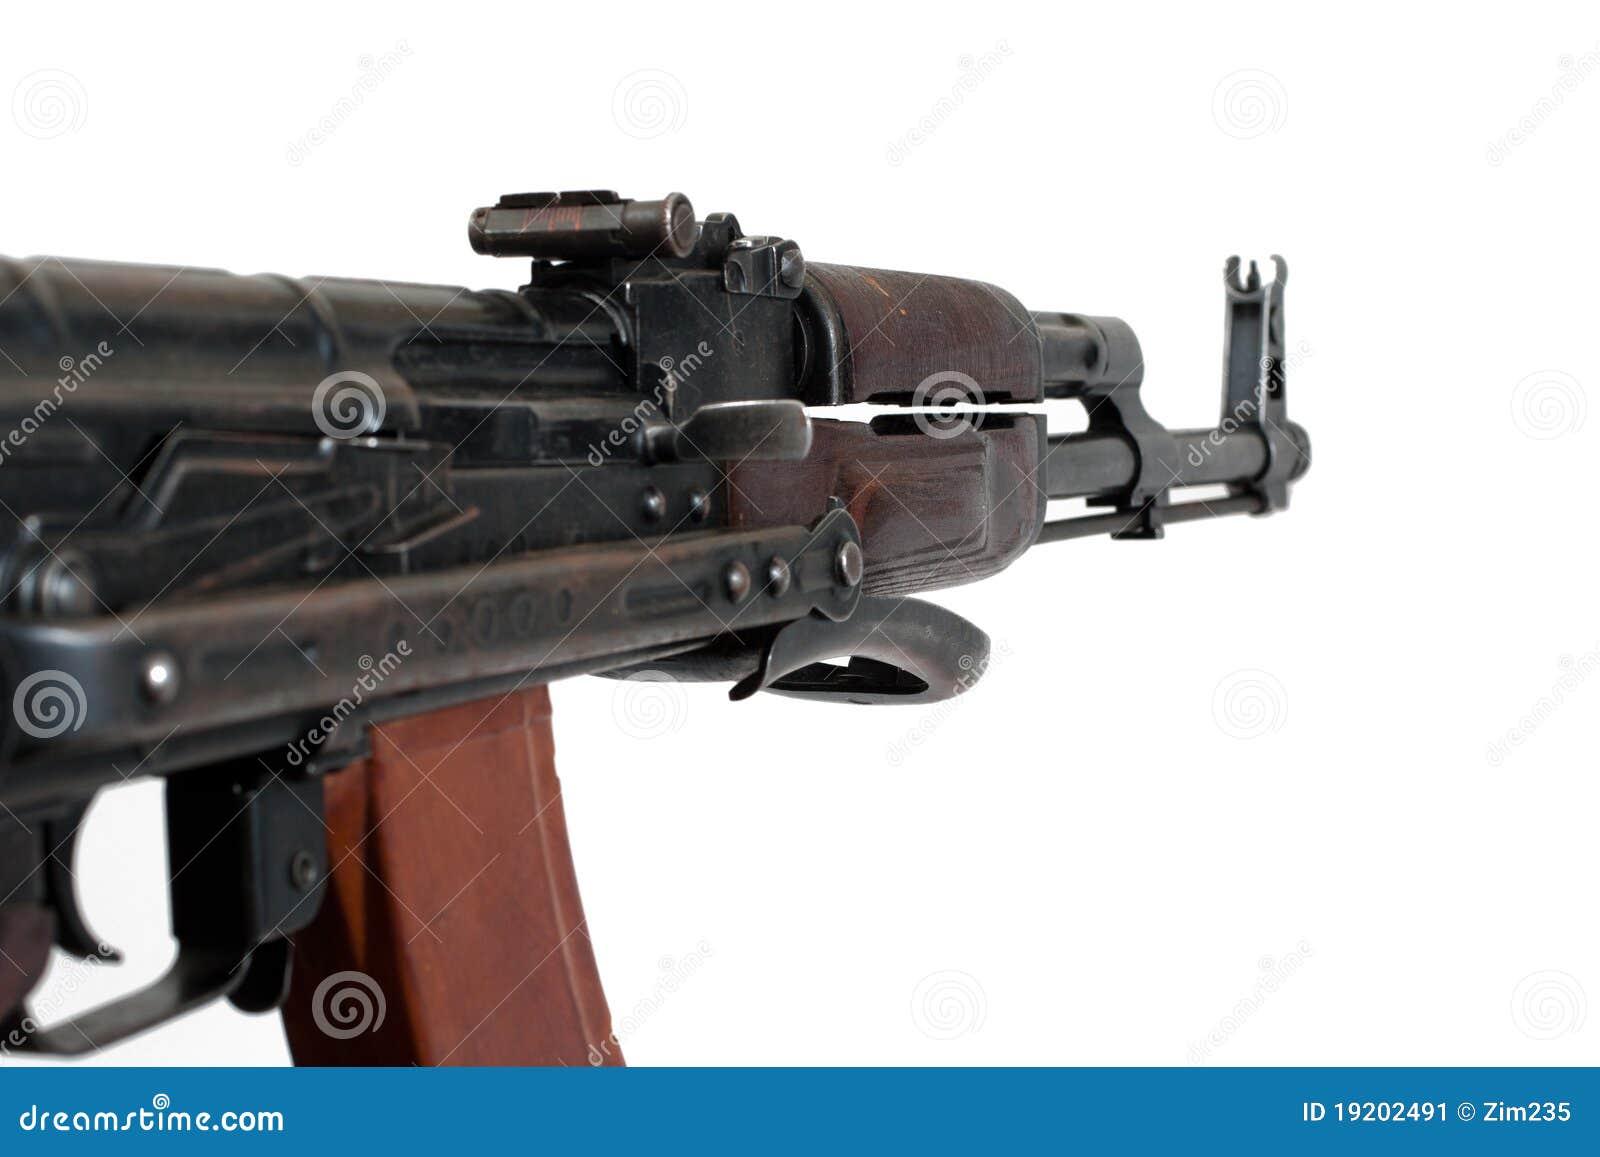 AKMS airborn version of Kalashnikov assault rifle